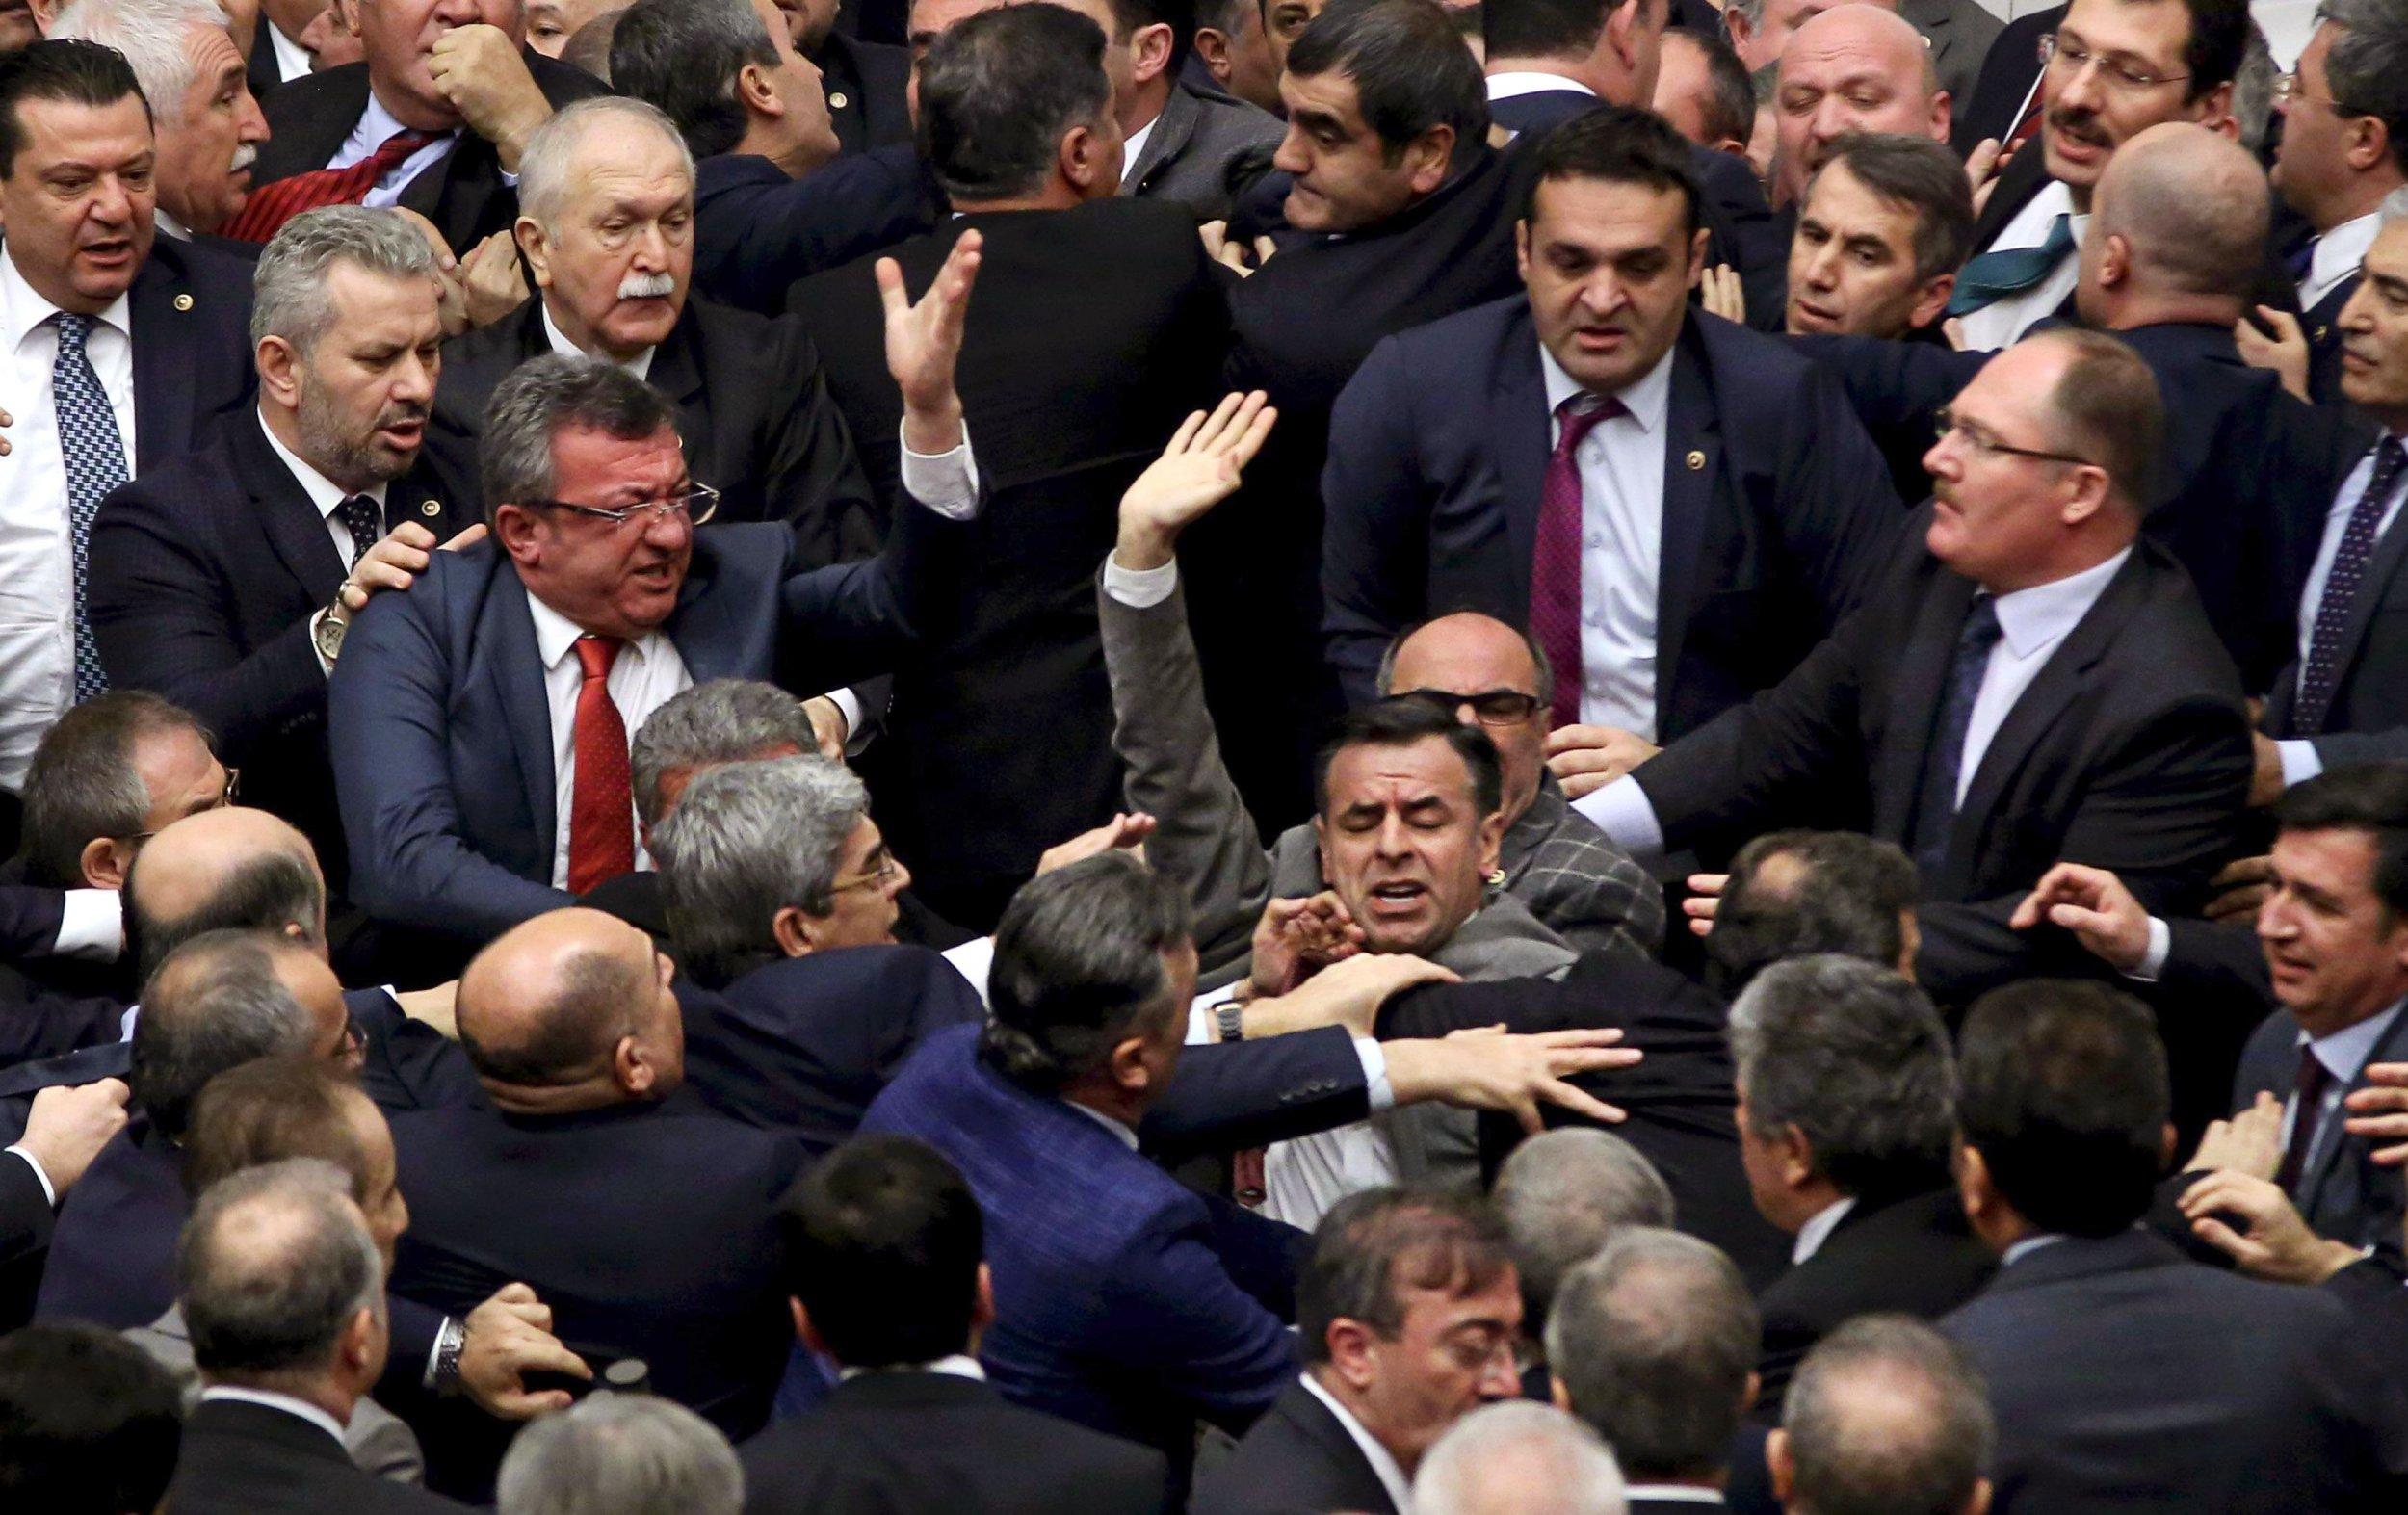 Turkish politicians